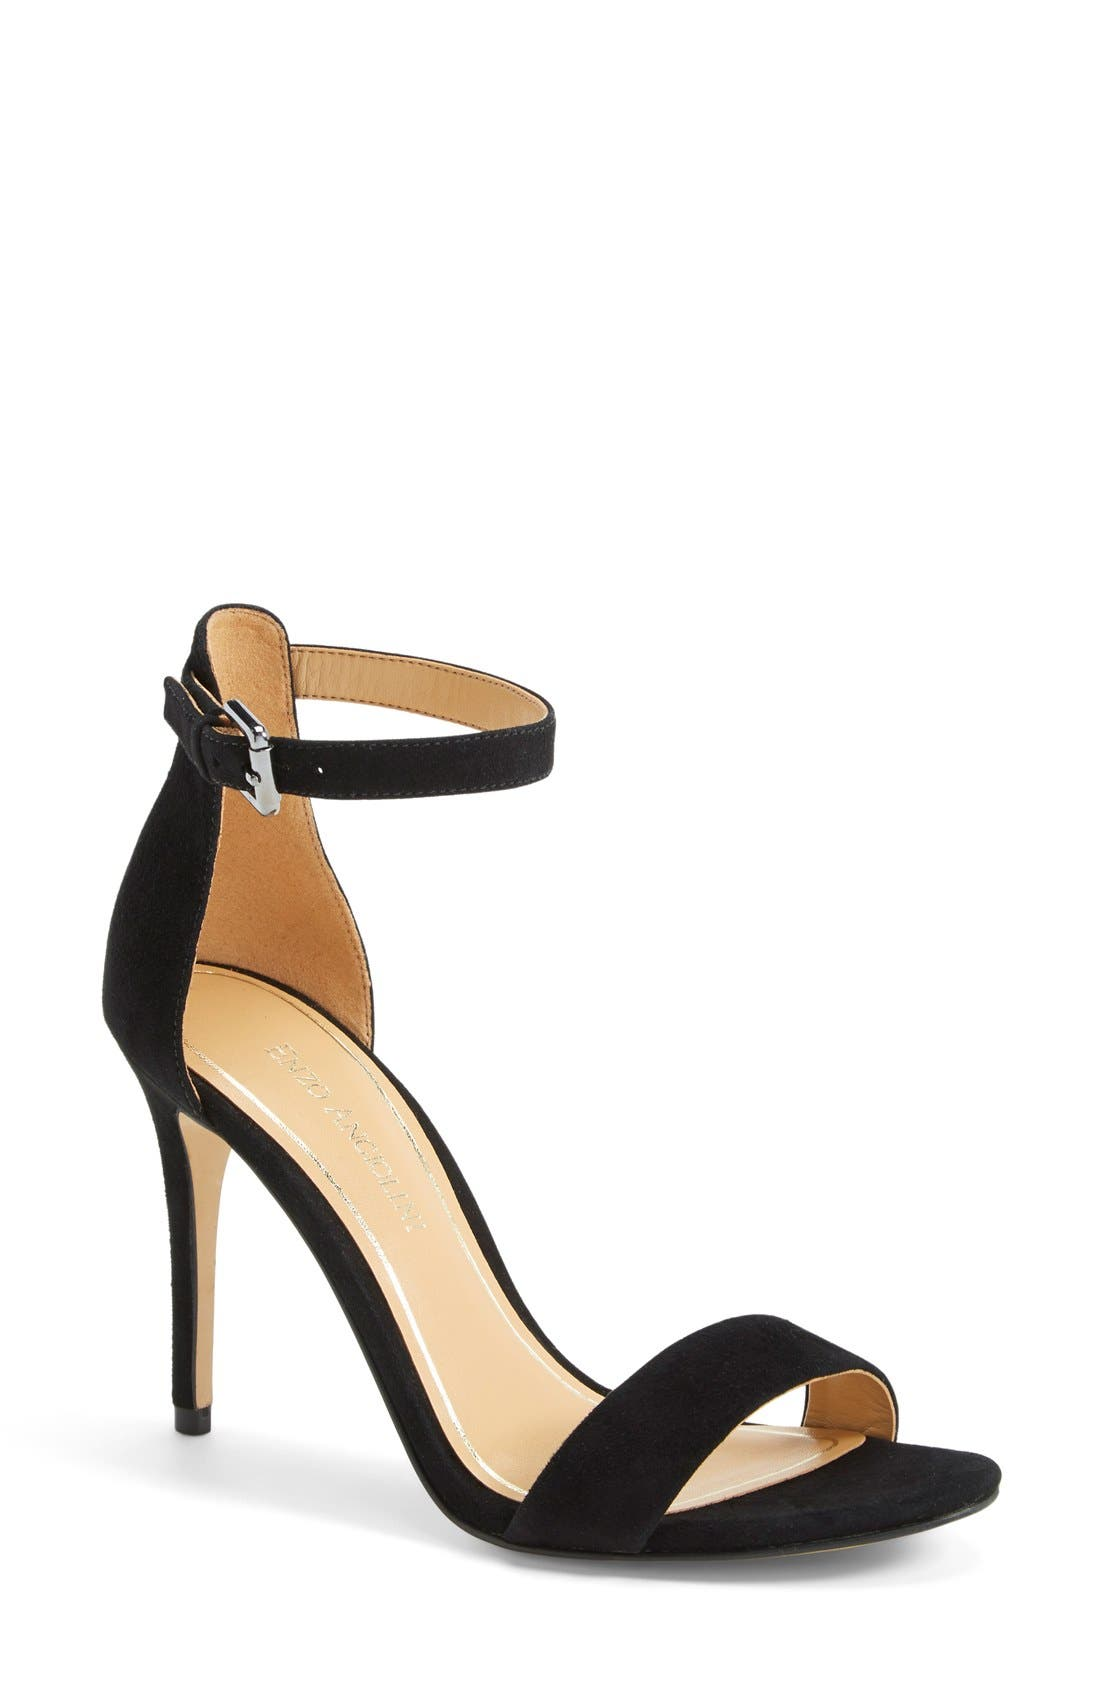 'Manna' Ankle Strap Sandal,                         Main,                         color, 001